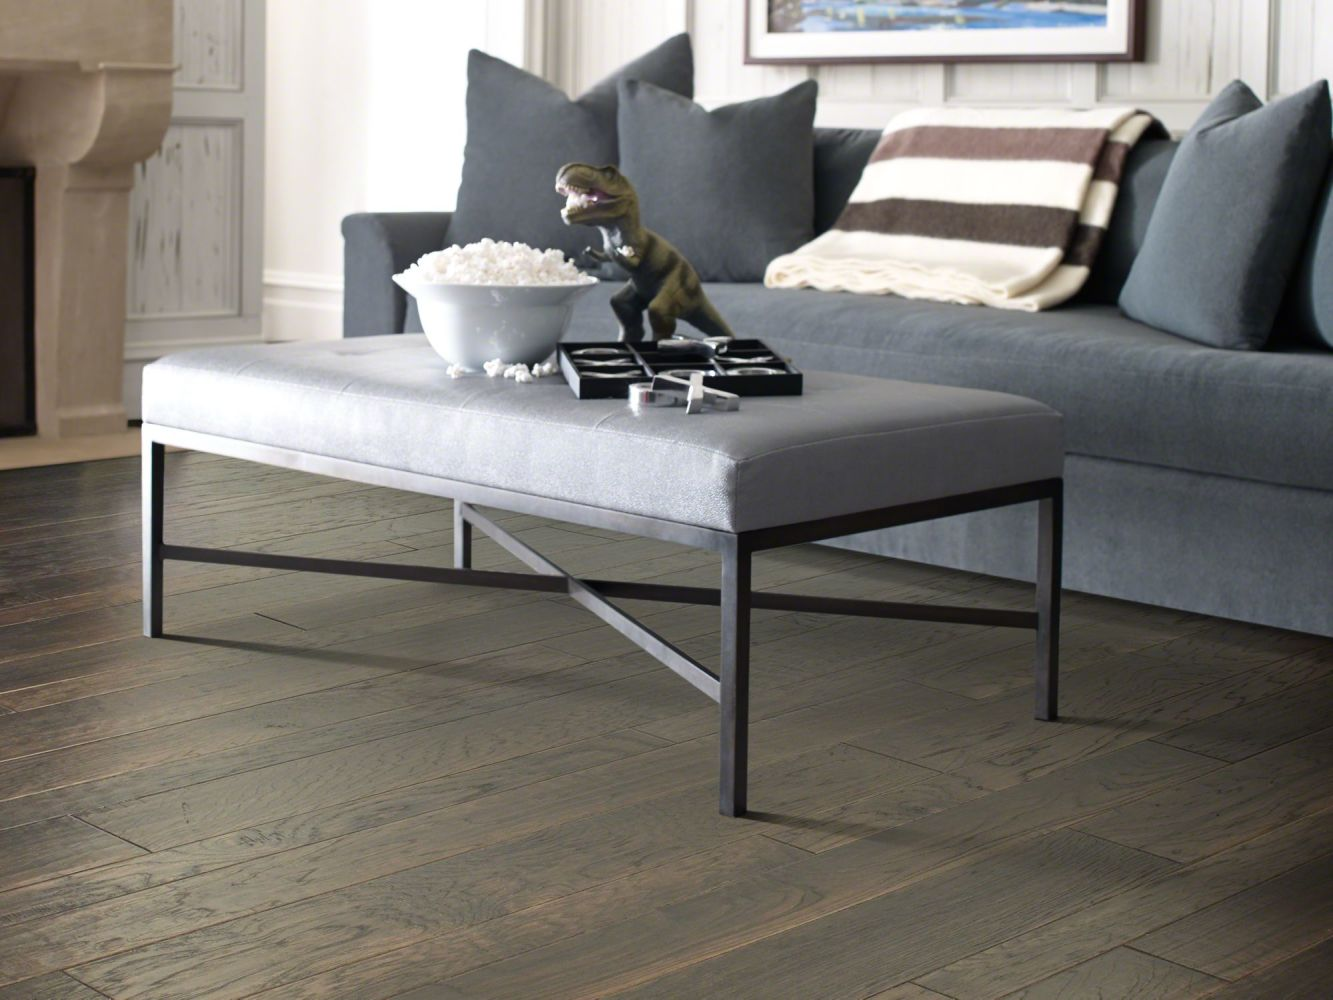 Shaw Floors Home Fn Gold Hardwood Leesburg 2 – Mixed Stonehenge 00510_HW619